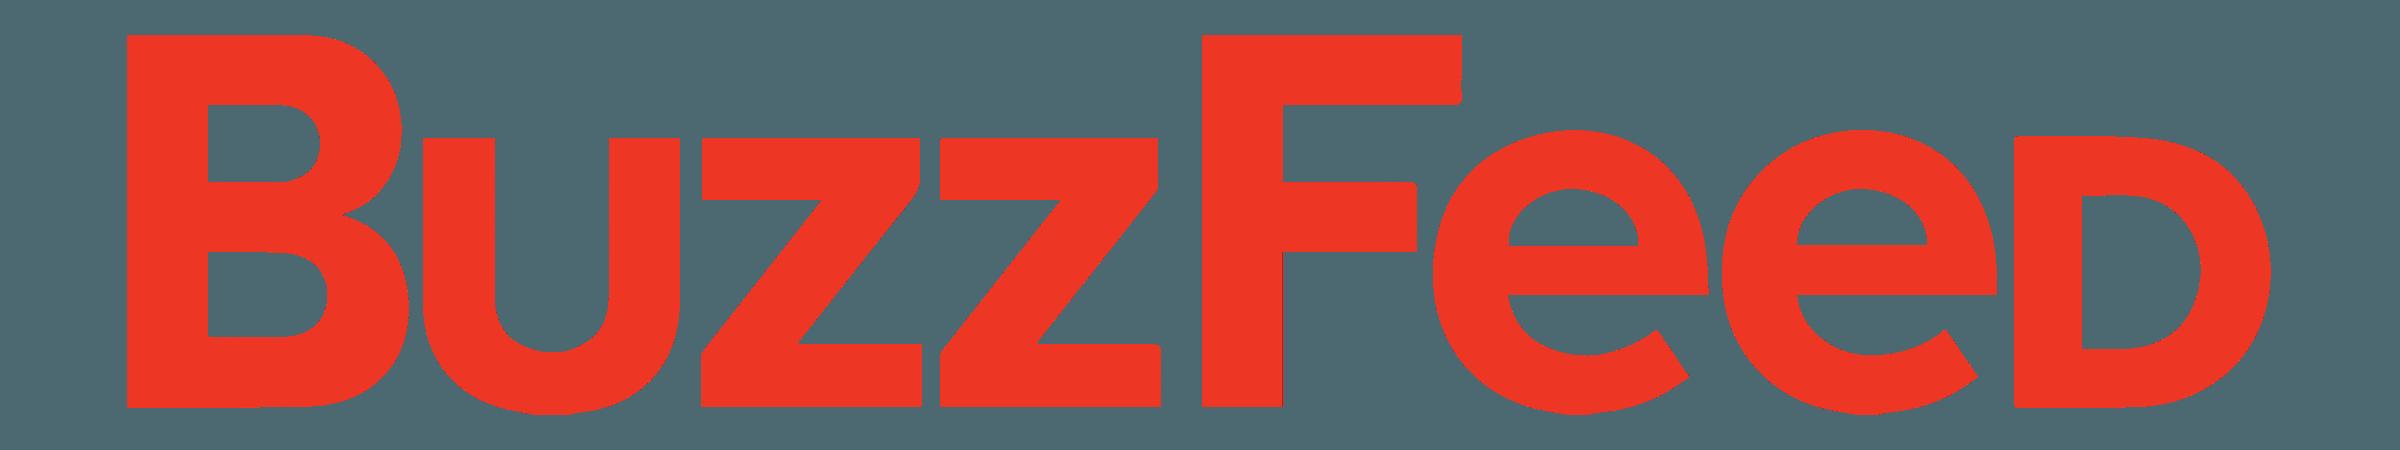 BuzzFeed Logo PNG Transparent & SVG Vector.